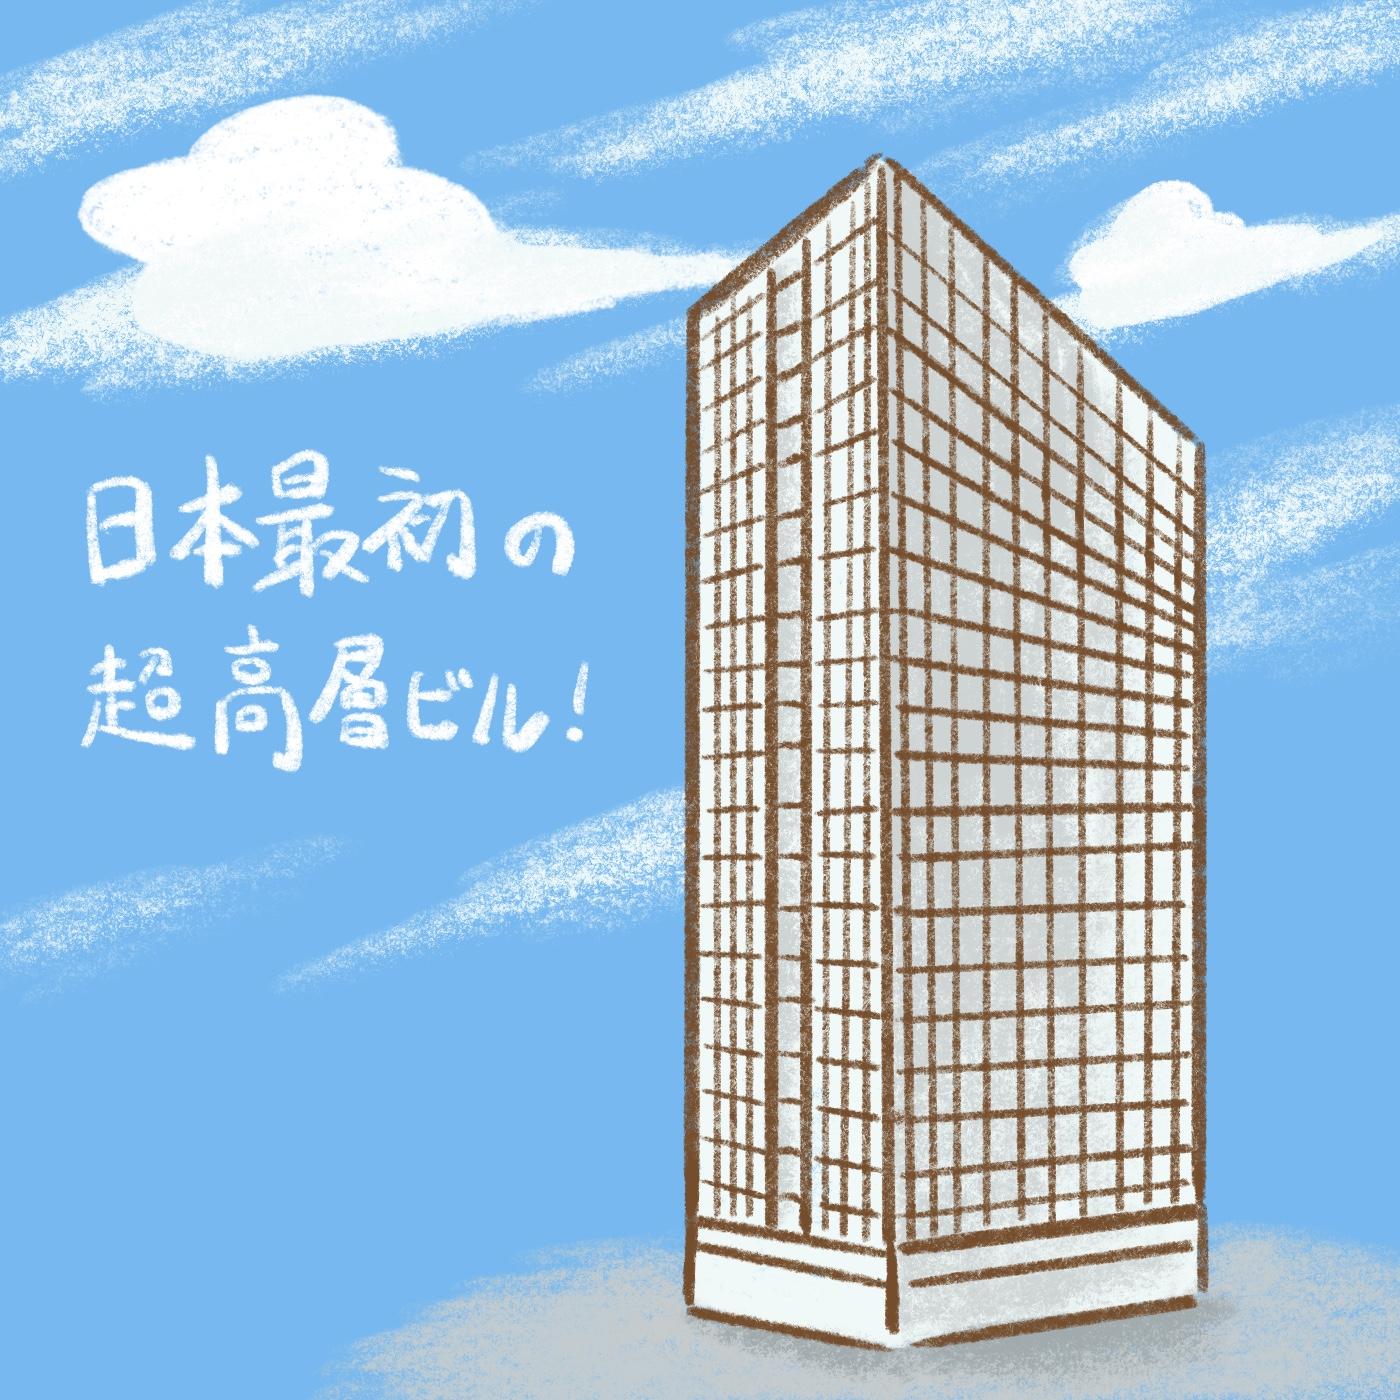 OBIKAKE ナニソレ 霞が関ビルディング 日本のたてもの展 東京国立科学博物館